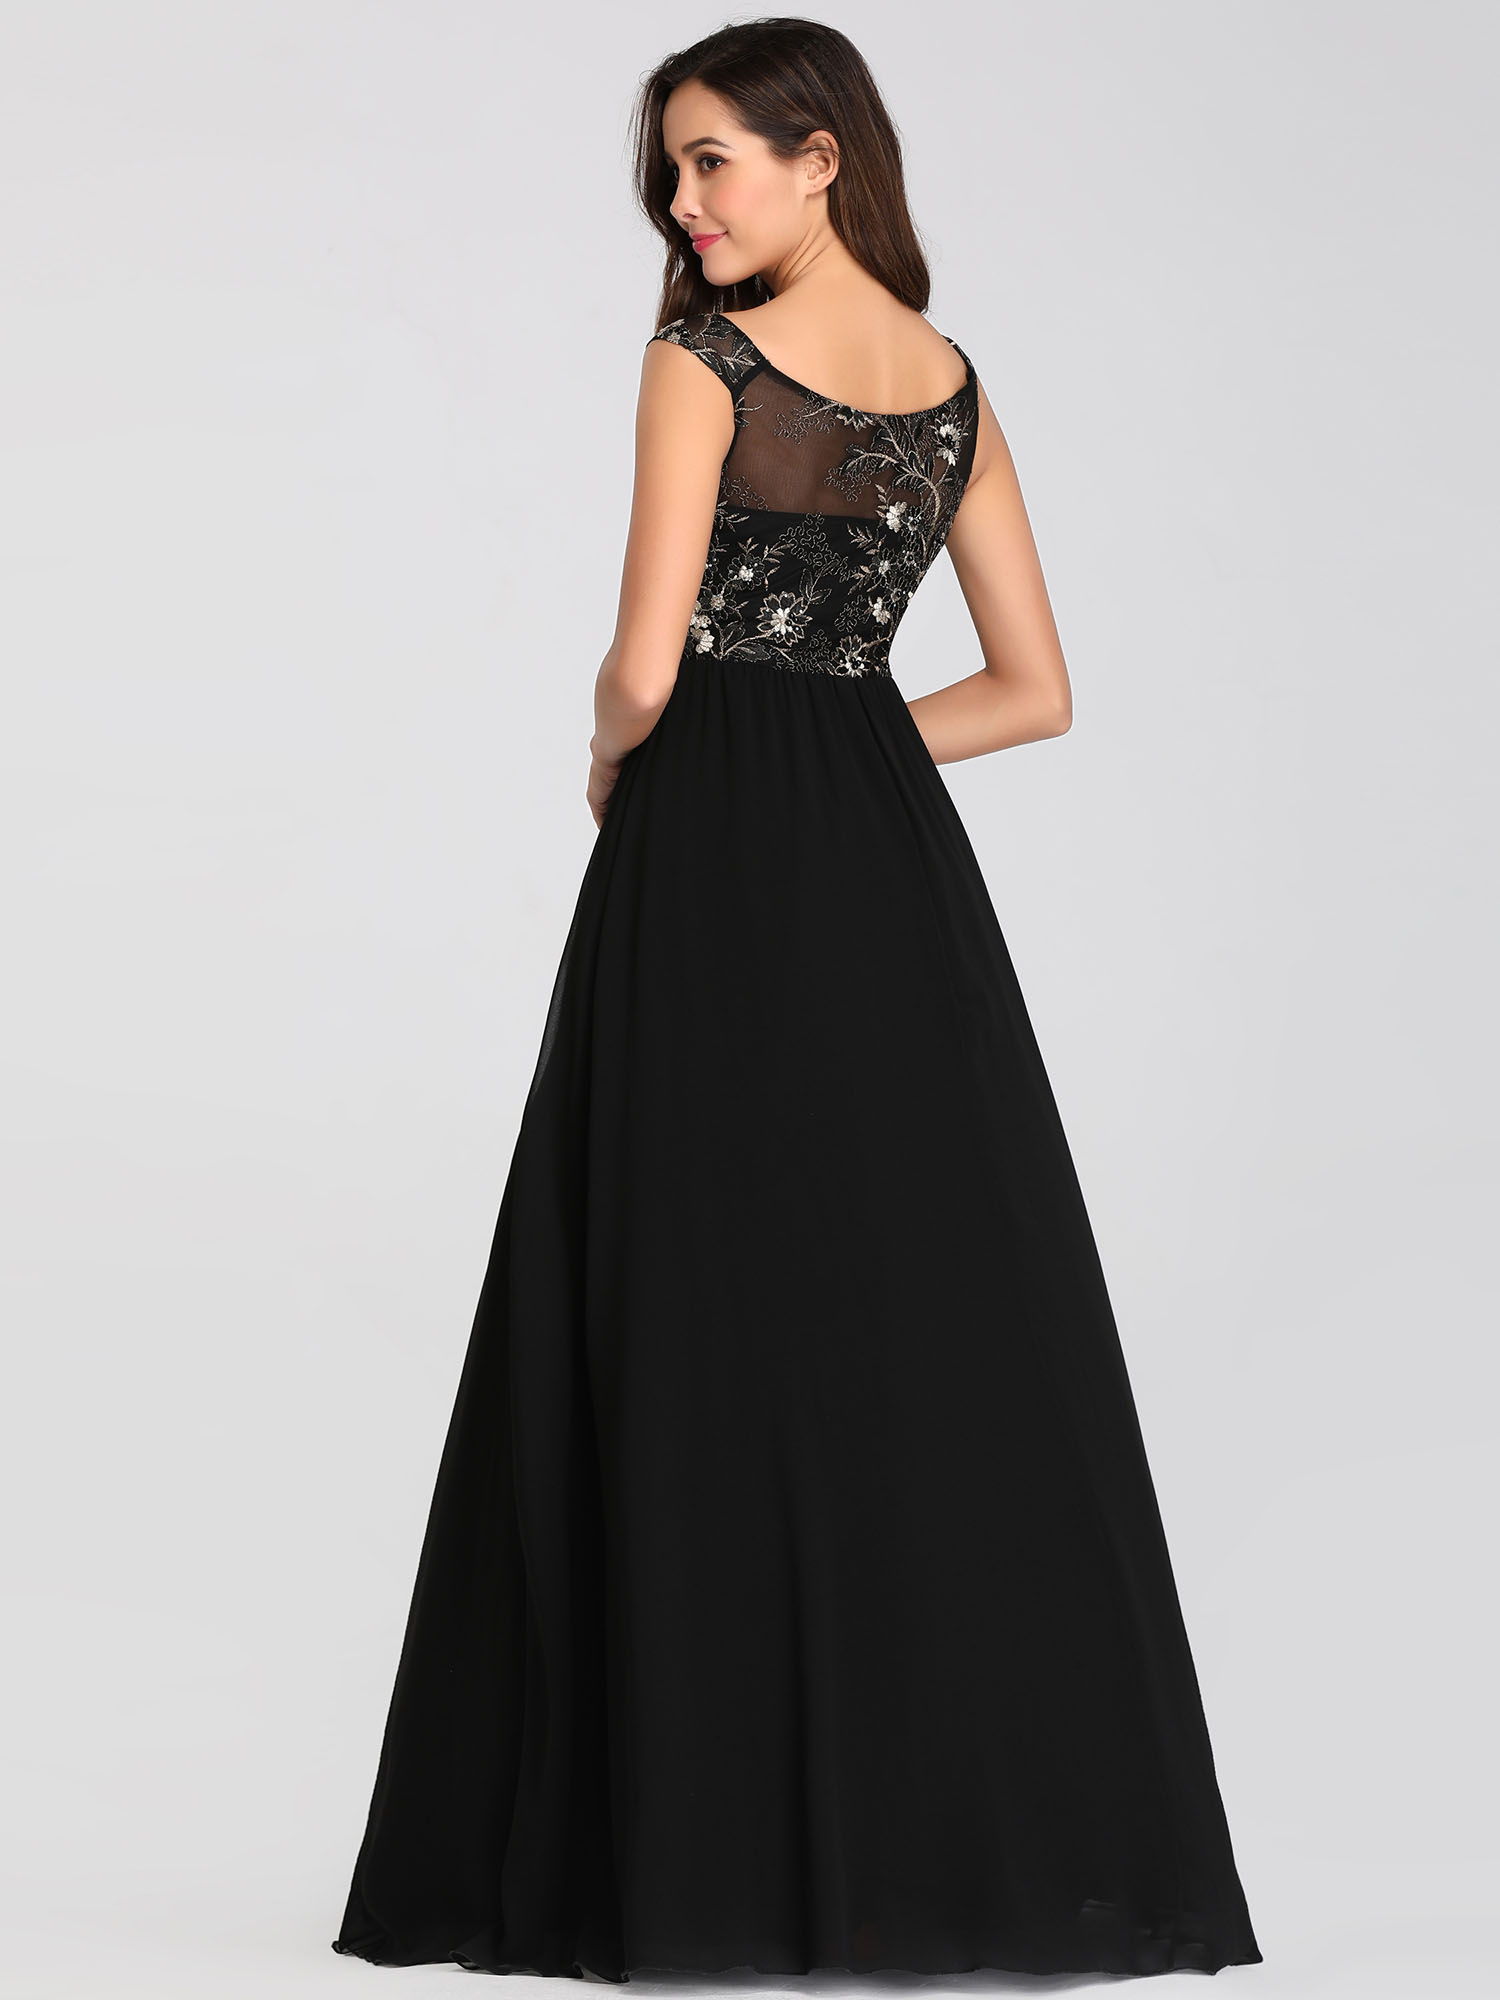 Ever-pretty US Evening Black Party Dress Women A-line ...